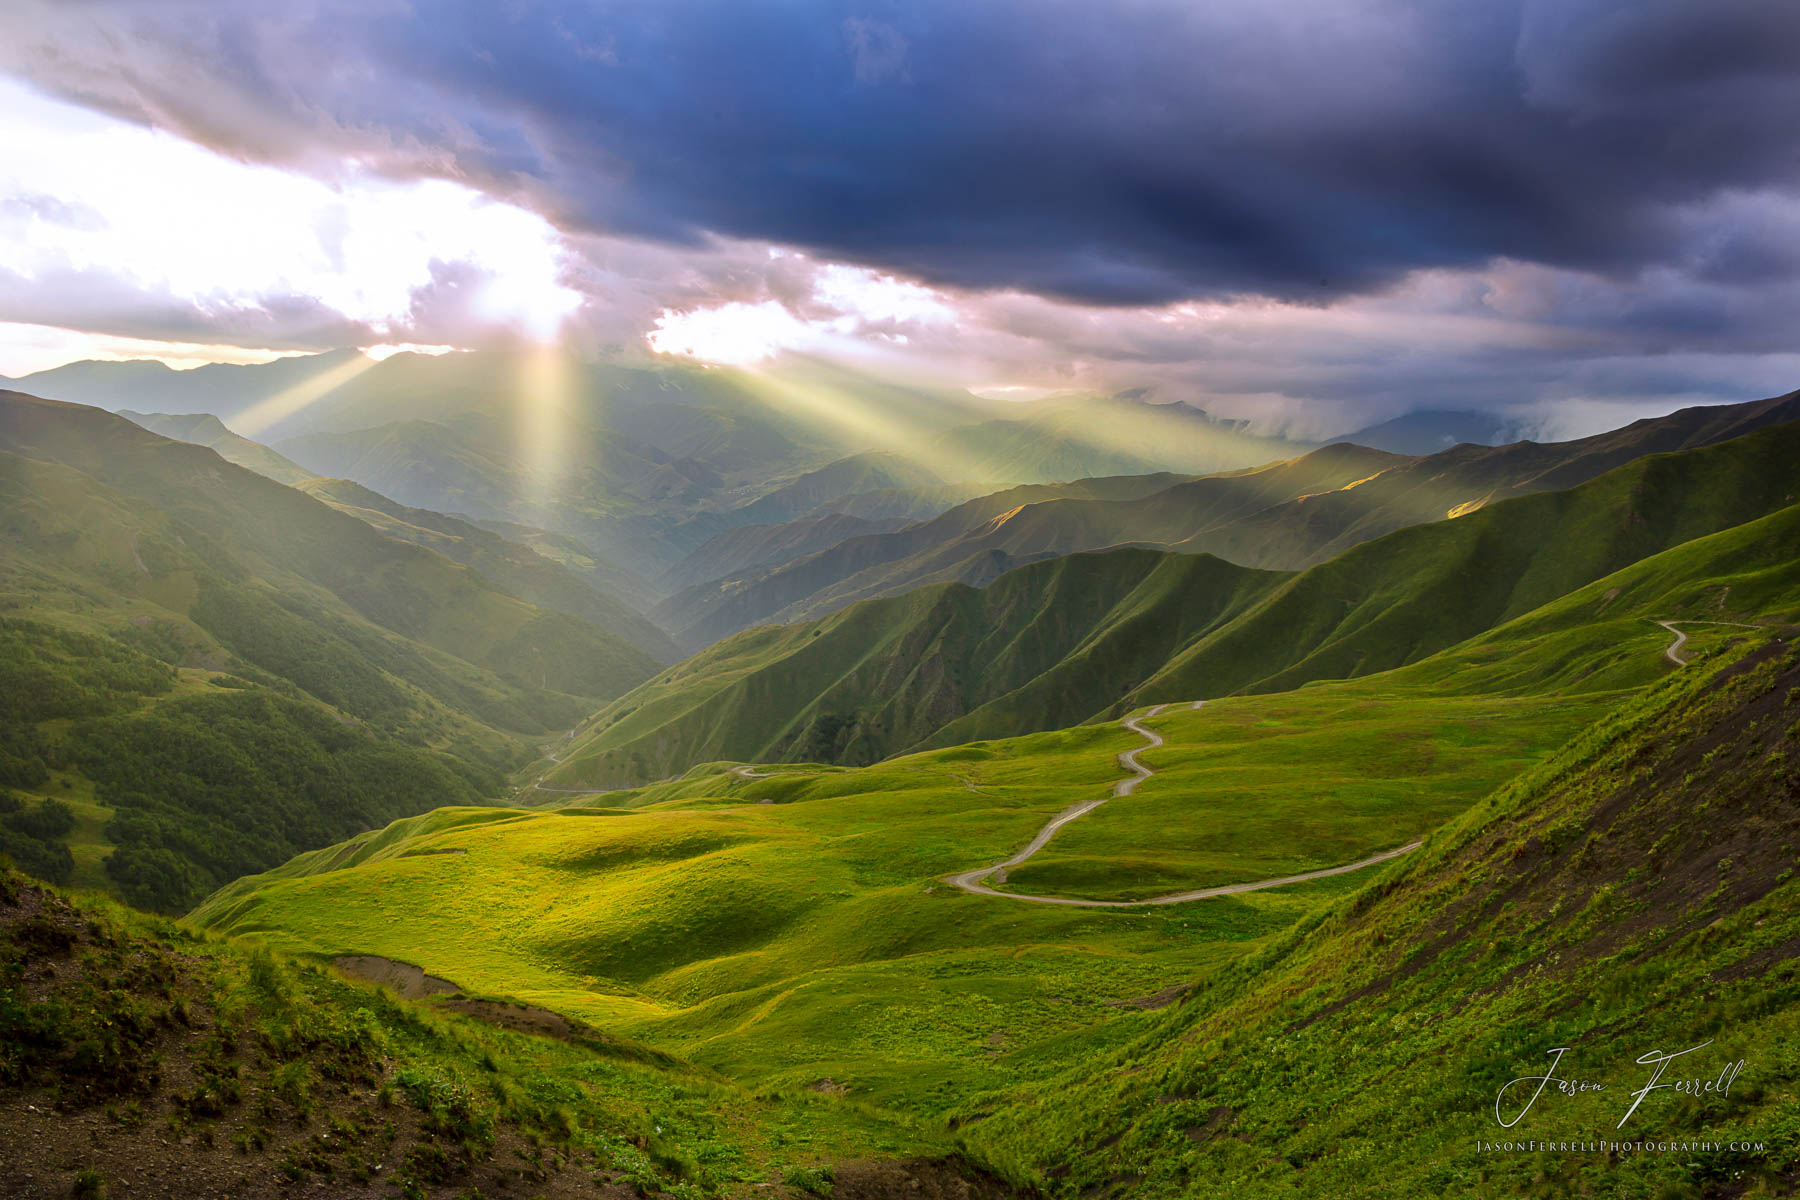 heaven, earth, sunlight, beams, sunset, sunrise, god, caucasus mountains, republic of georgia, world, photo